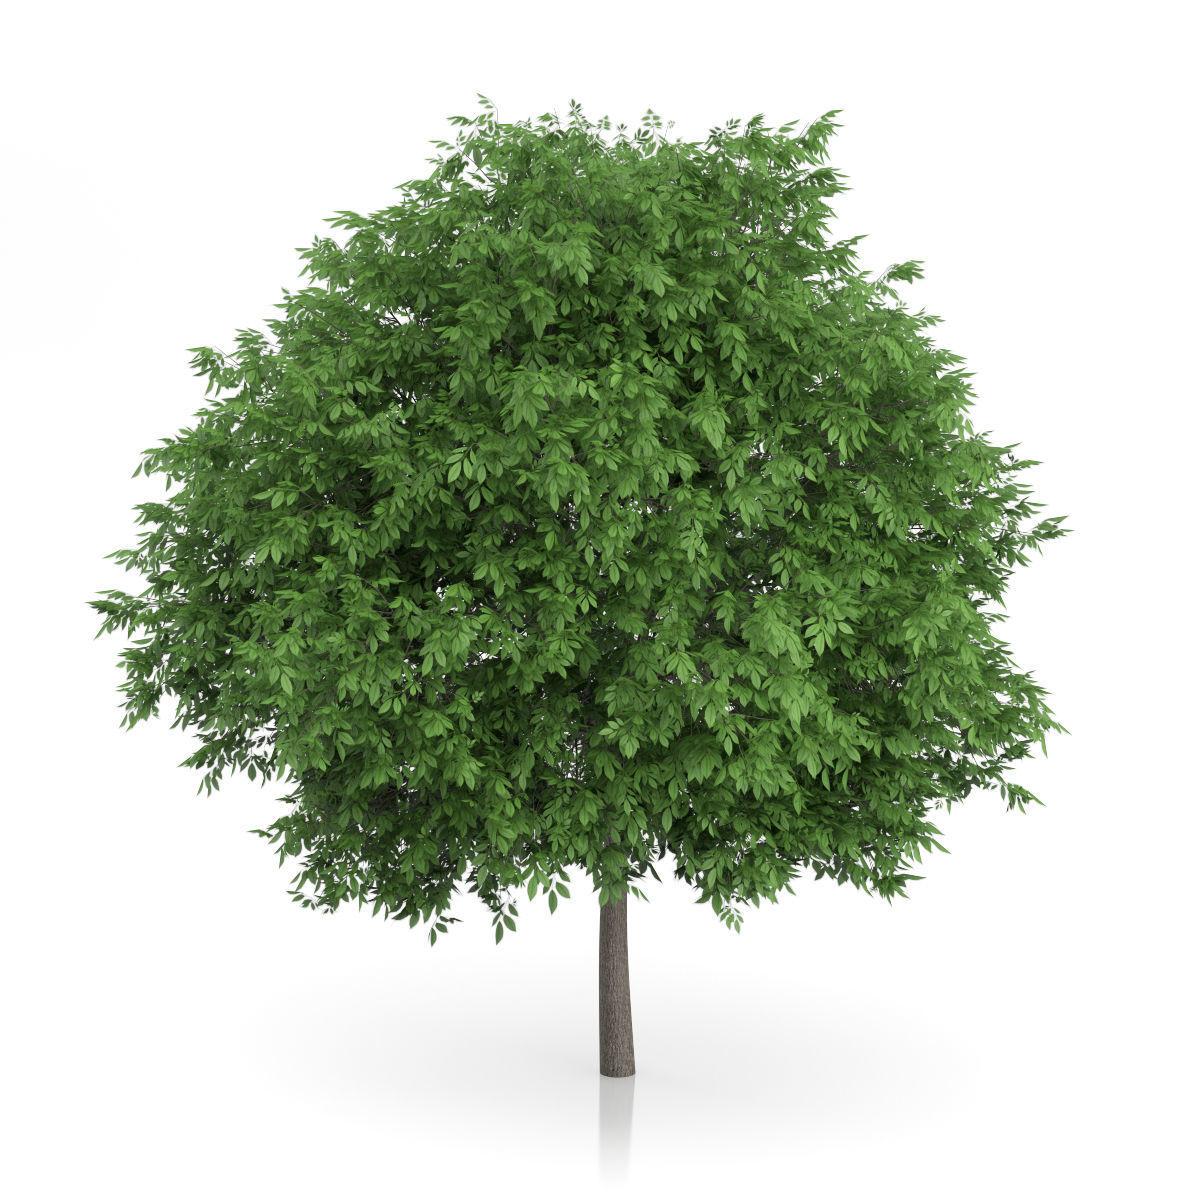 Common Walnut Tree Juglans regia